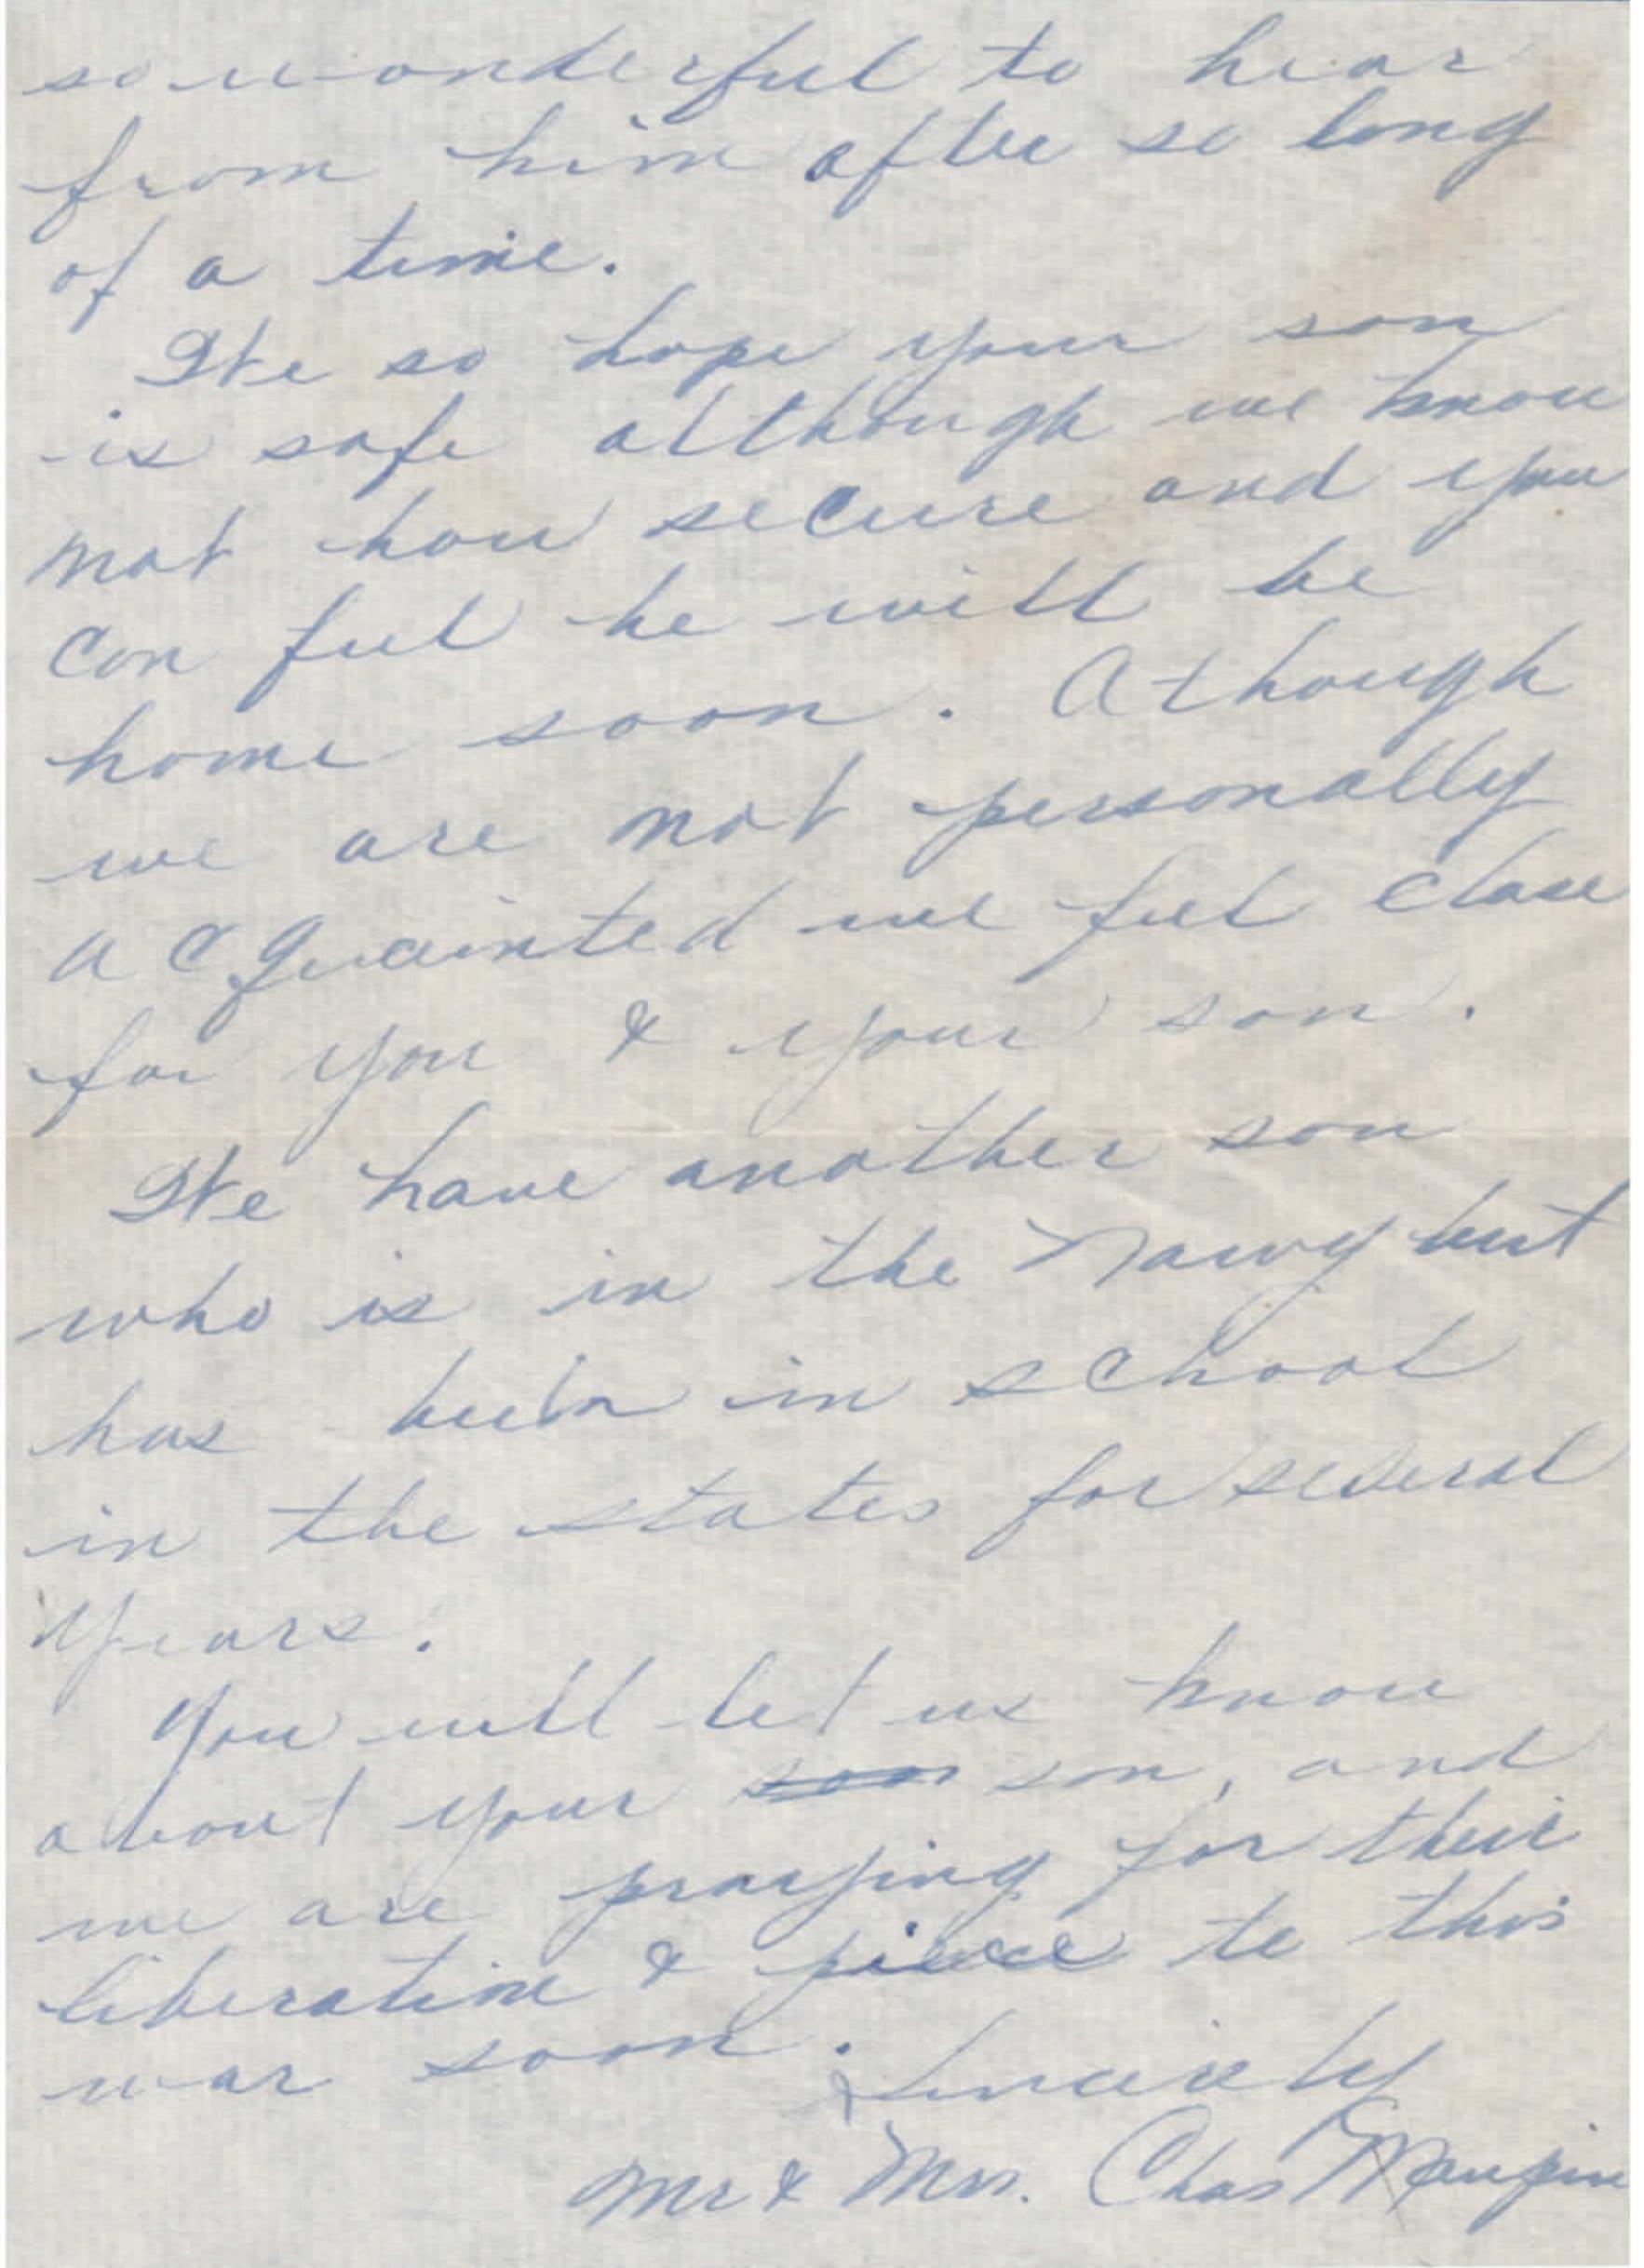 Maupin 3-15-1945 3.jpg